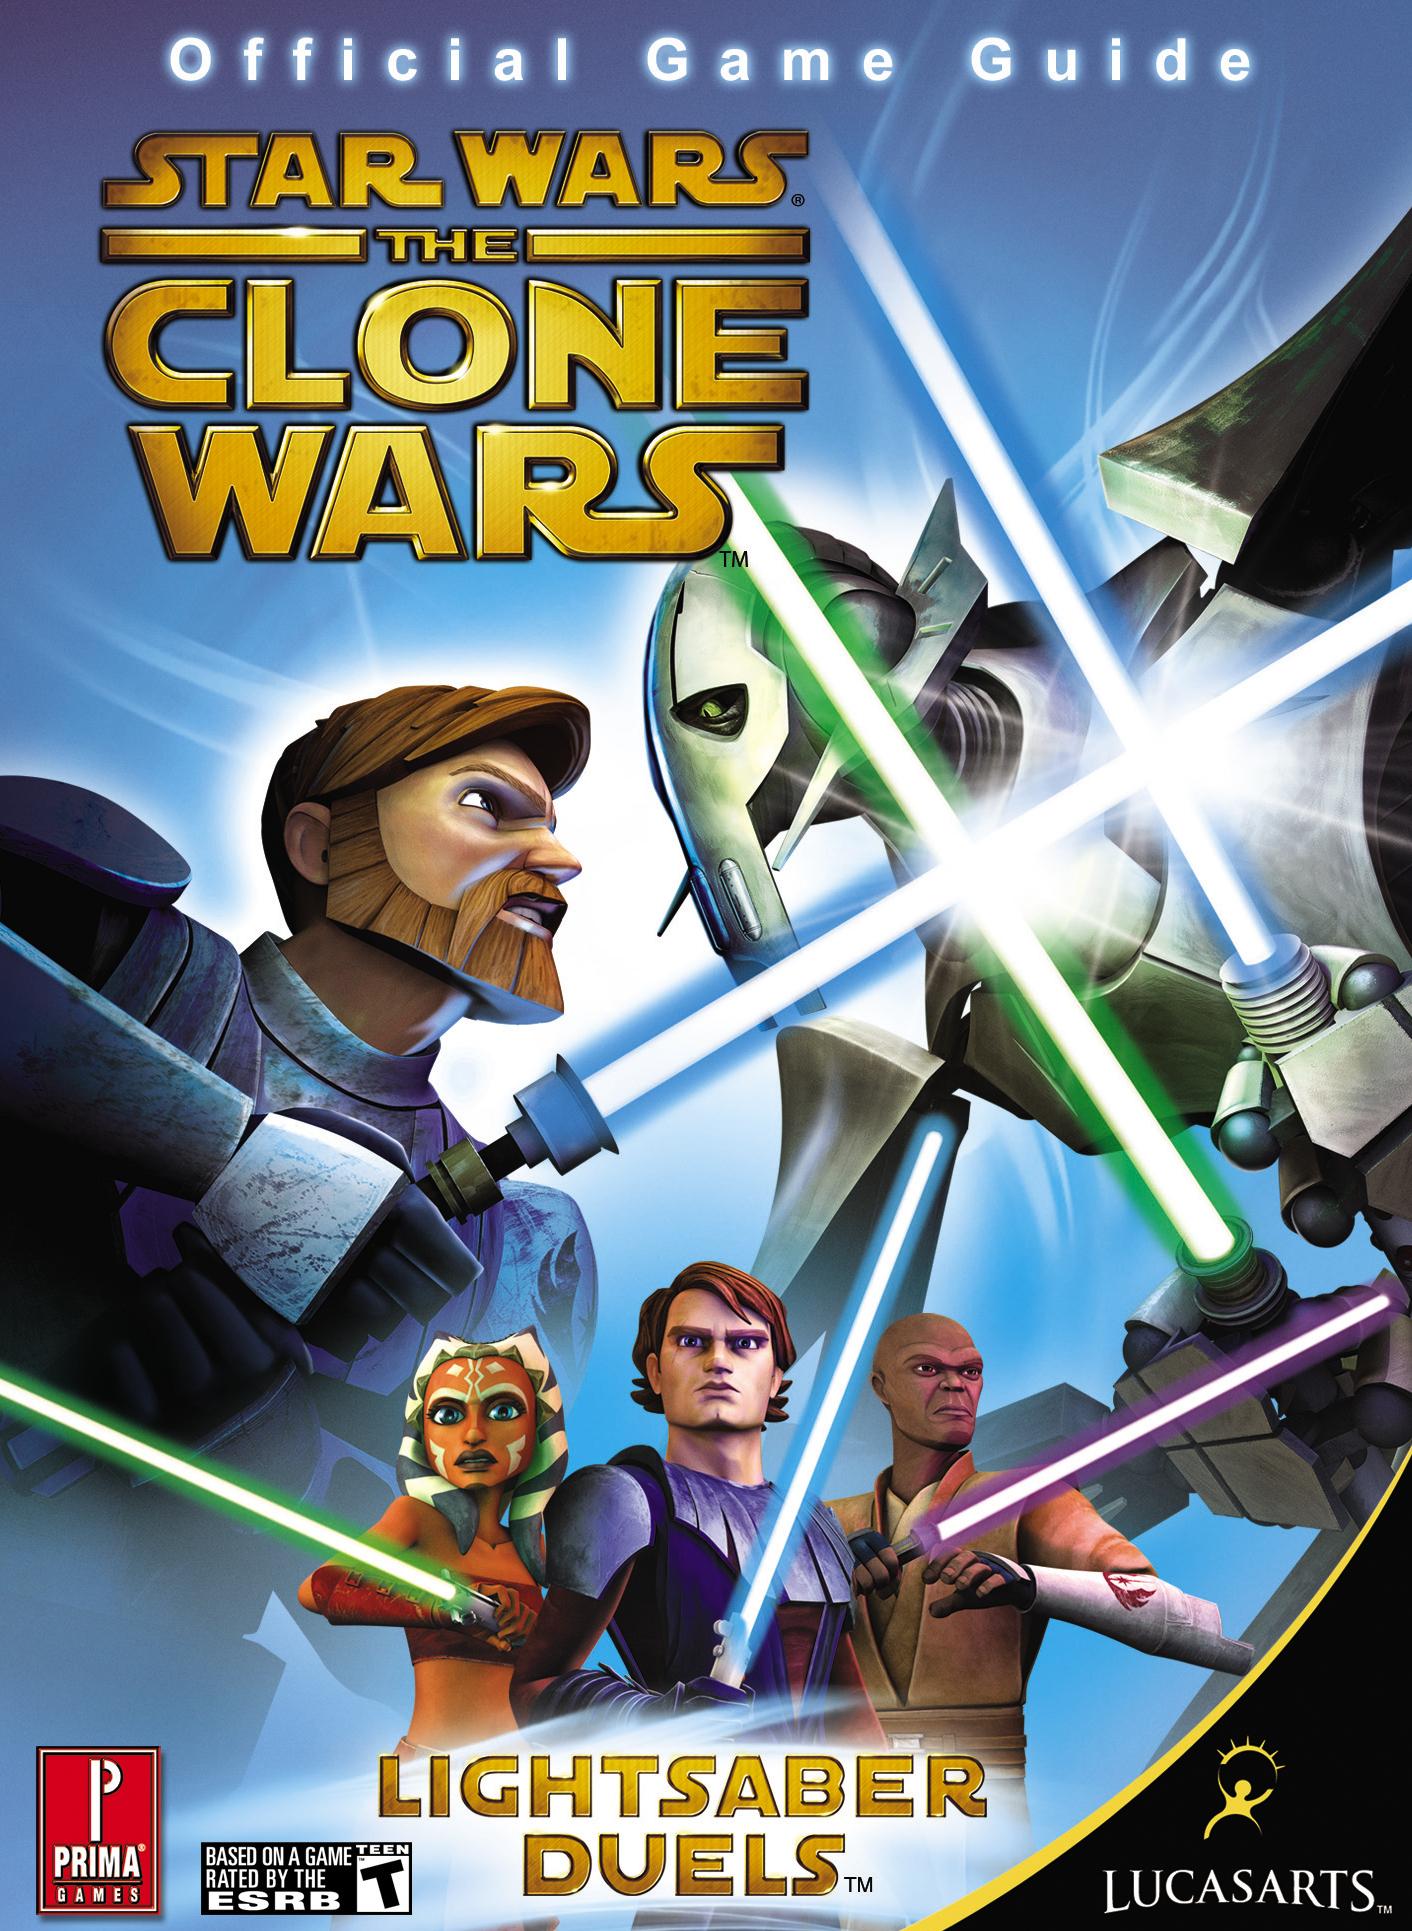 Star Wars: The Clone Wars: Lightsaber Duels: Официальное игровое руководство Prima